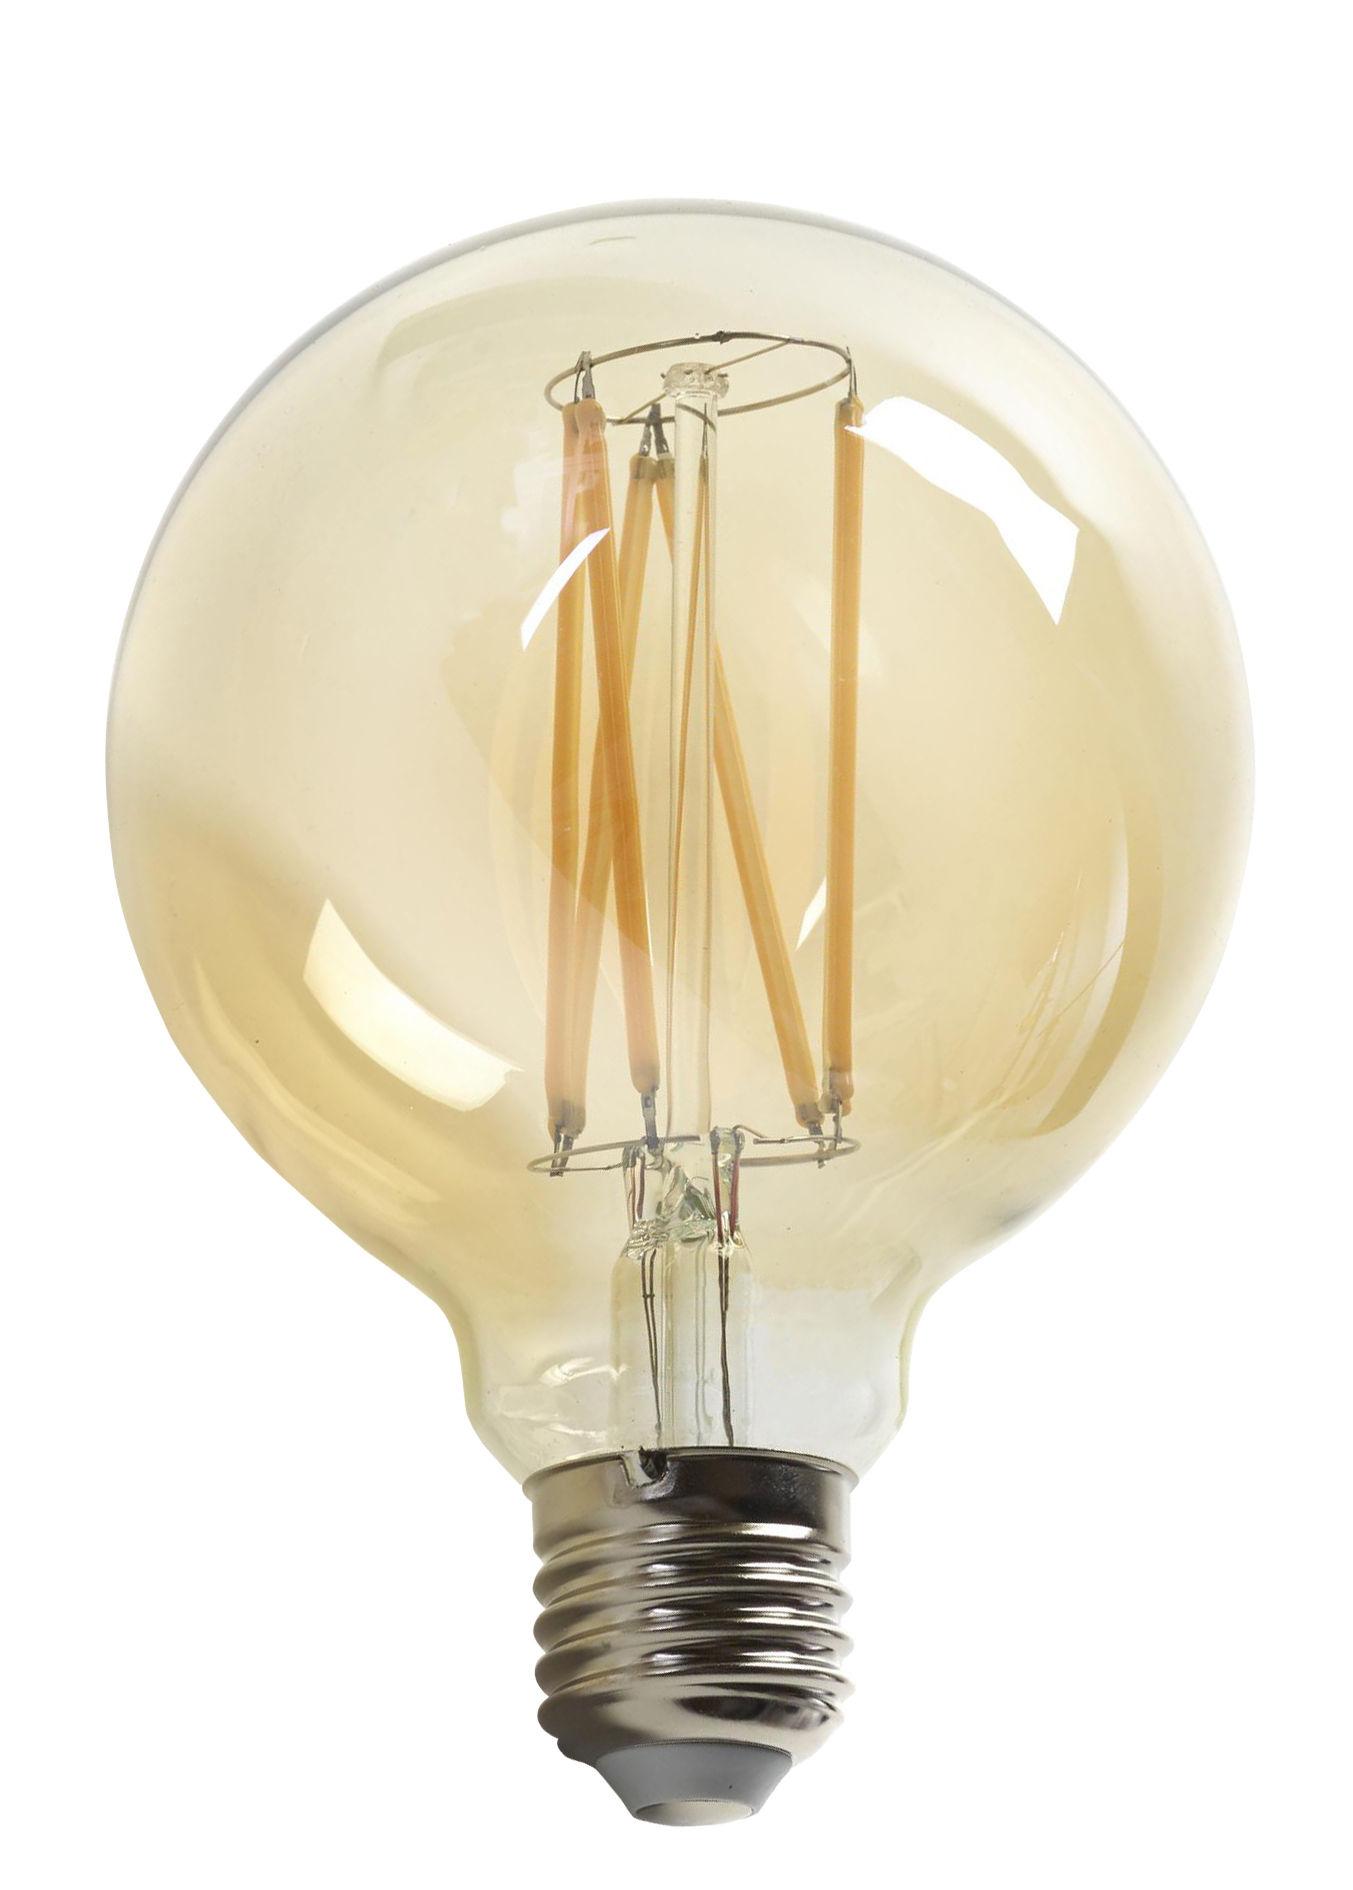 TransparentMade Design E27 Edison Filaments In Ampoule Serax Led 53AR4Lj